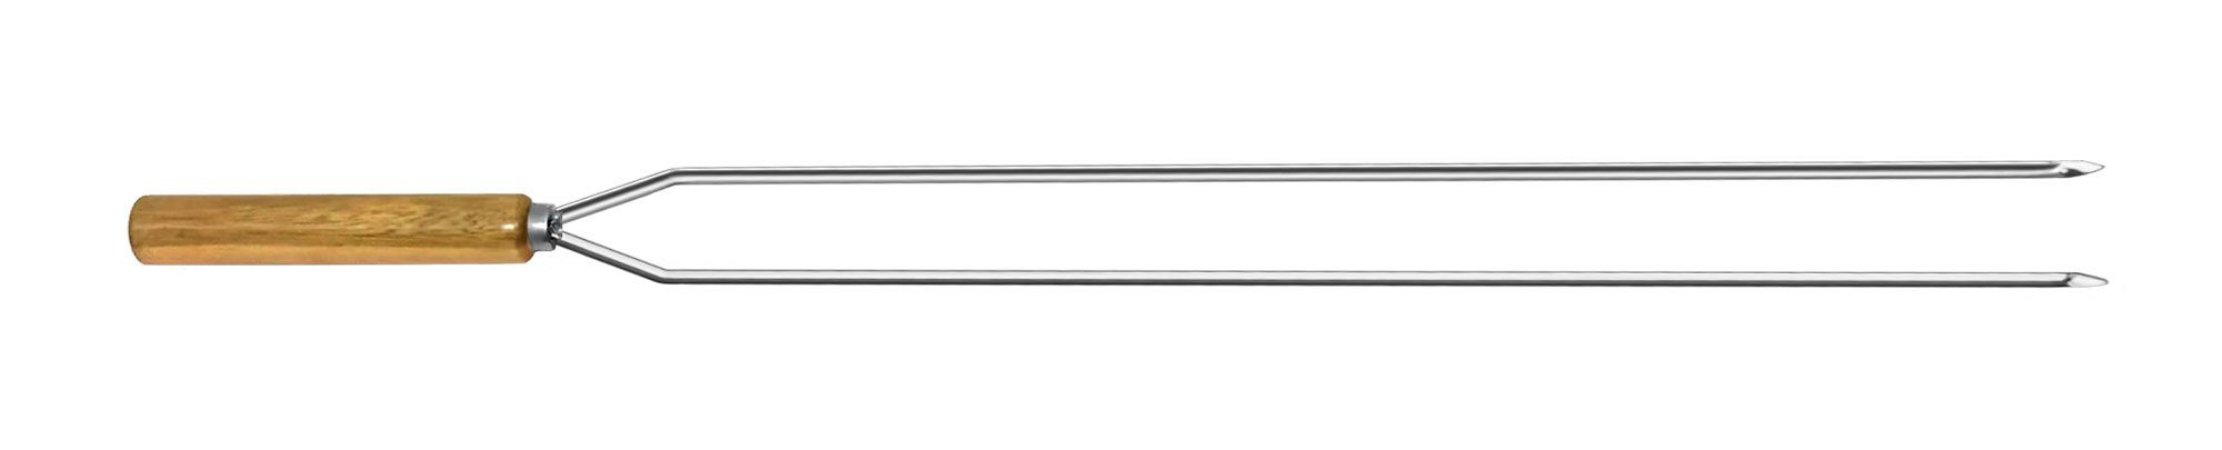 Espeto Inox Cupim Duplo 125 cm x 2 mm